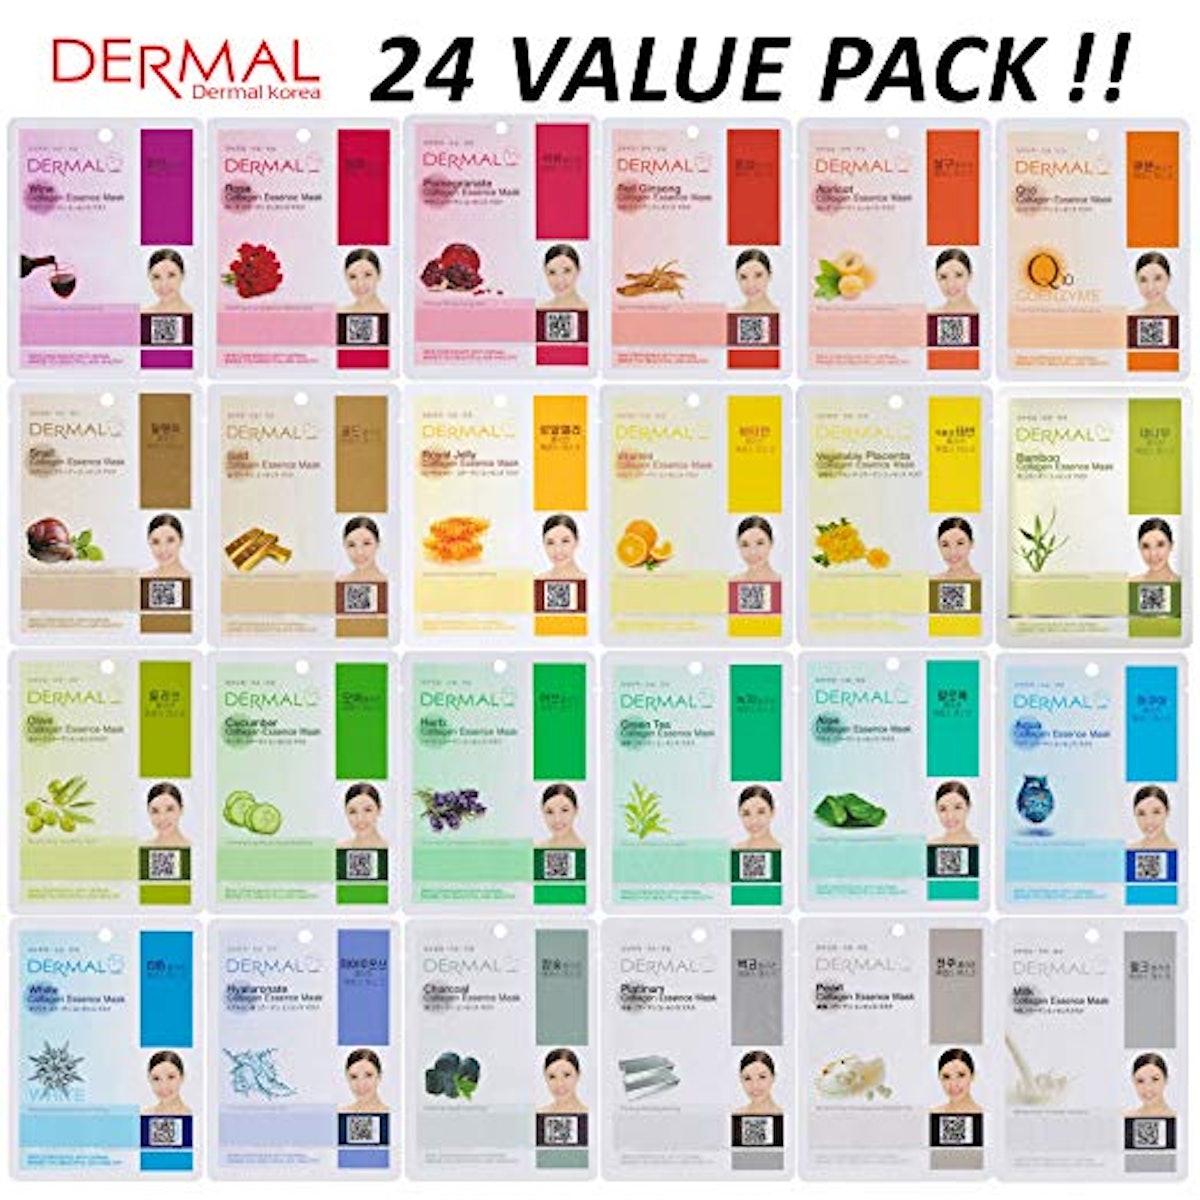 DERMAL Collagen Essence Full Face Mask Sheet (24-Pack)